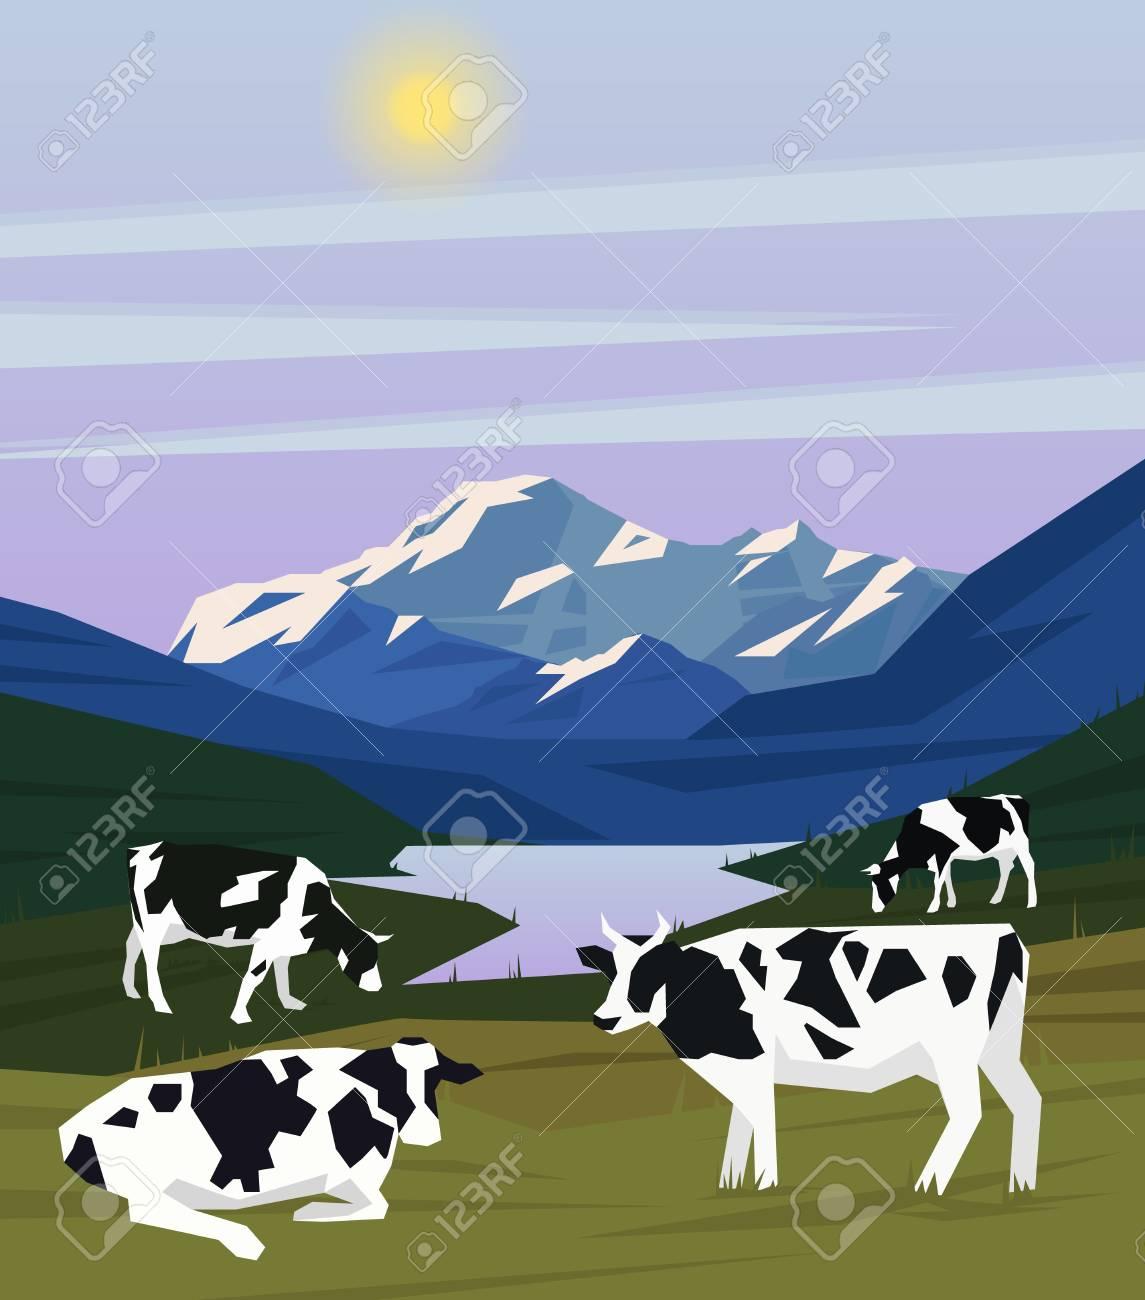 Plantilla De Dibujo Colorido Paisaje Naturaleza Con Montañas Del ...